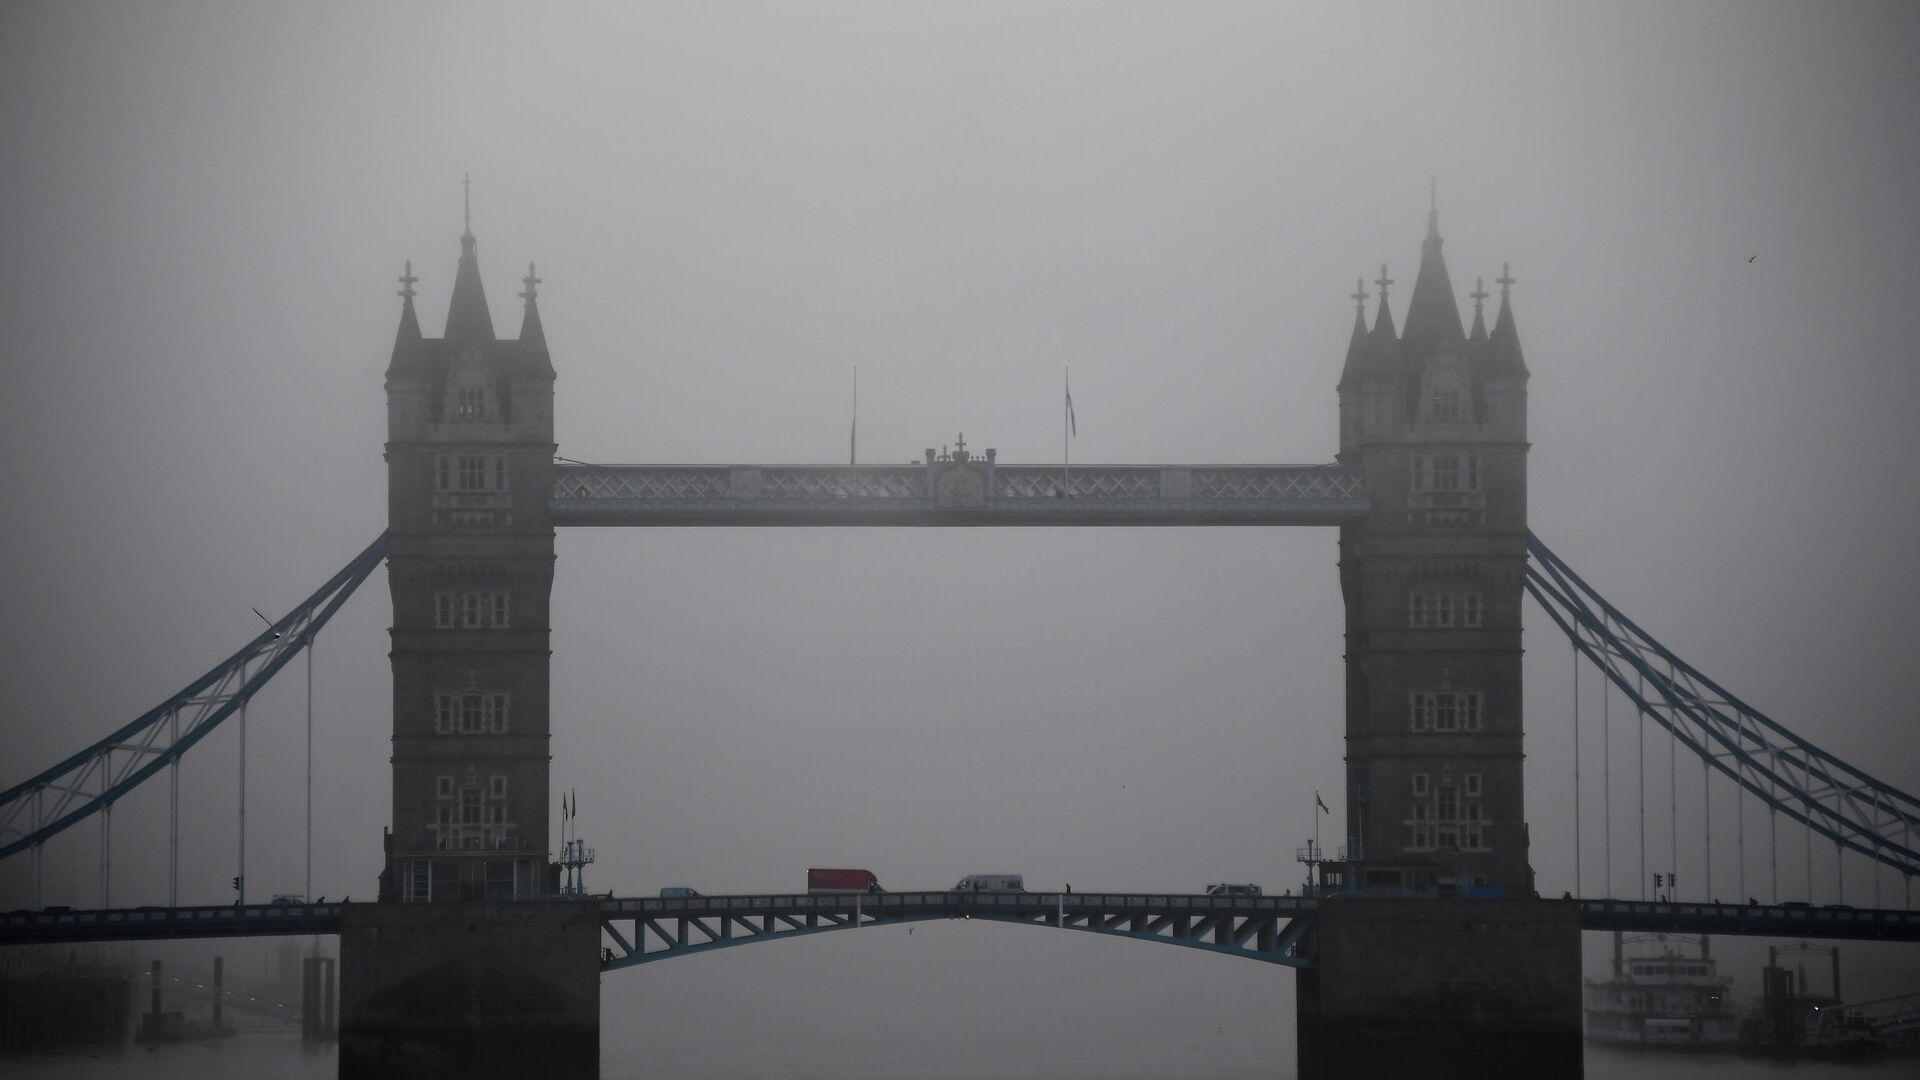 Вид на Тауэрский мост в Лондоне - РИА Новости, 1920, 15.10.2020